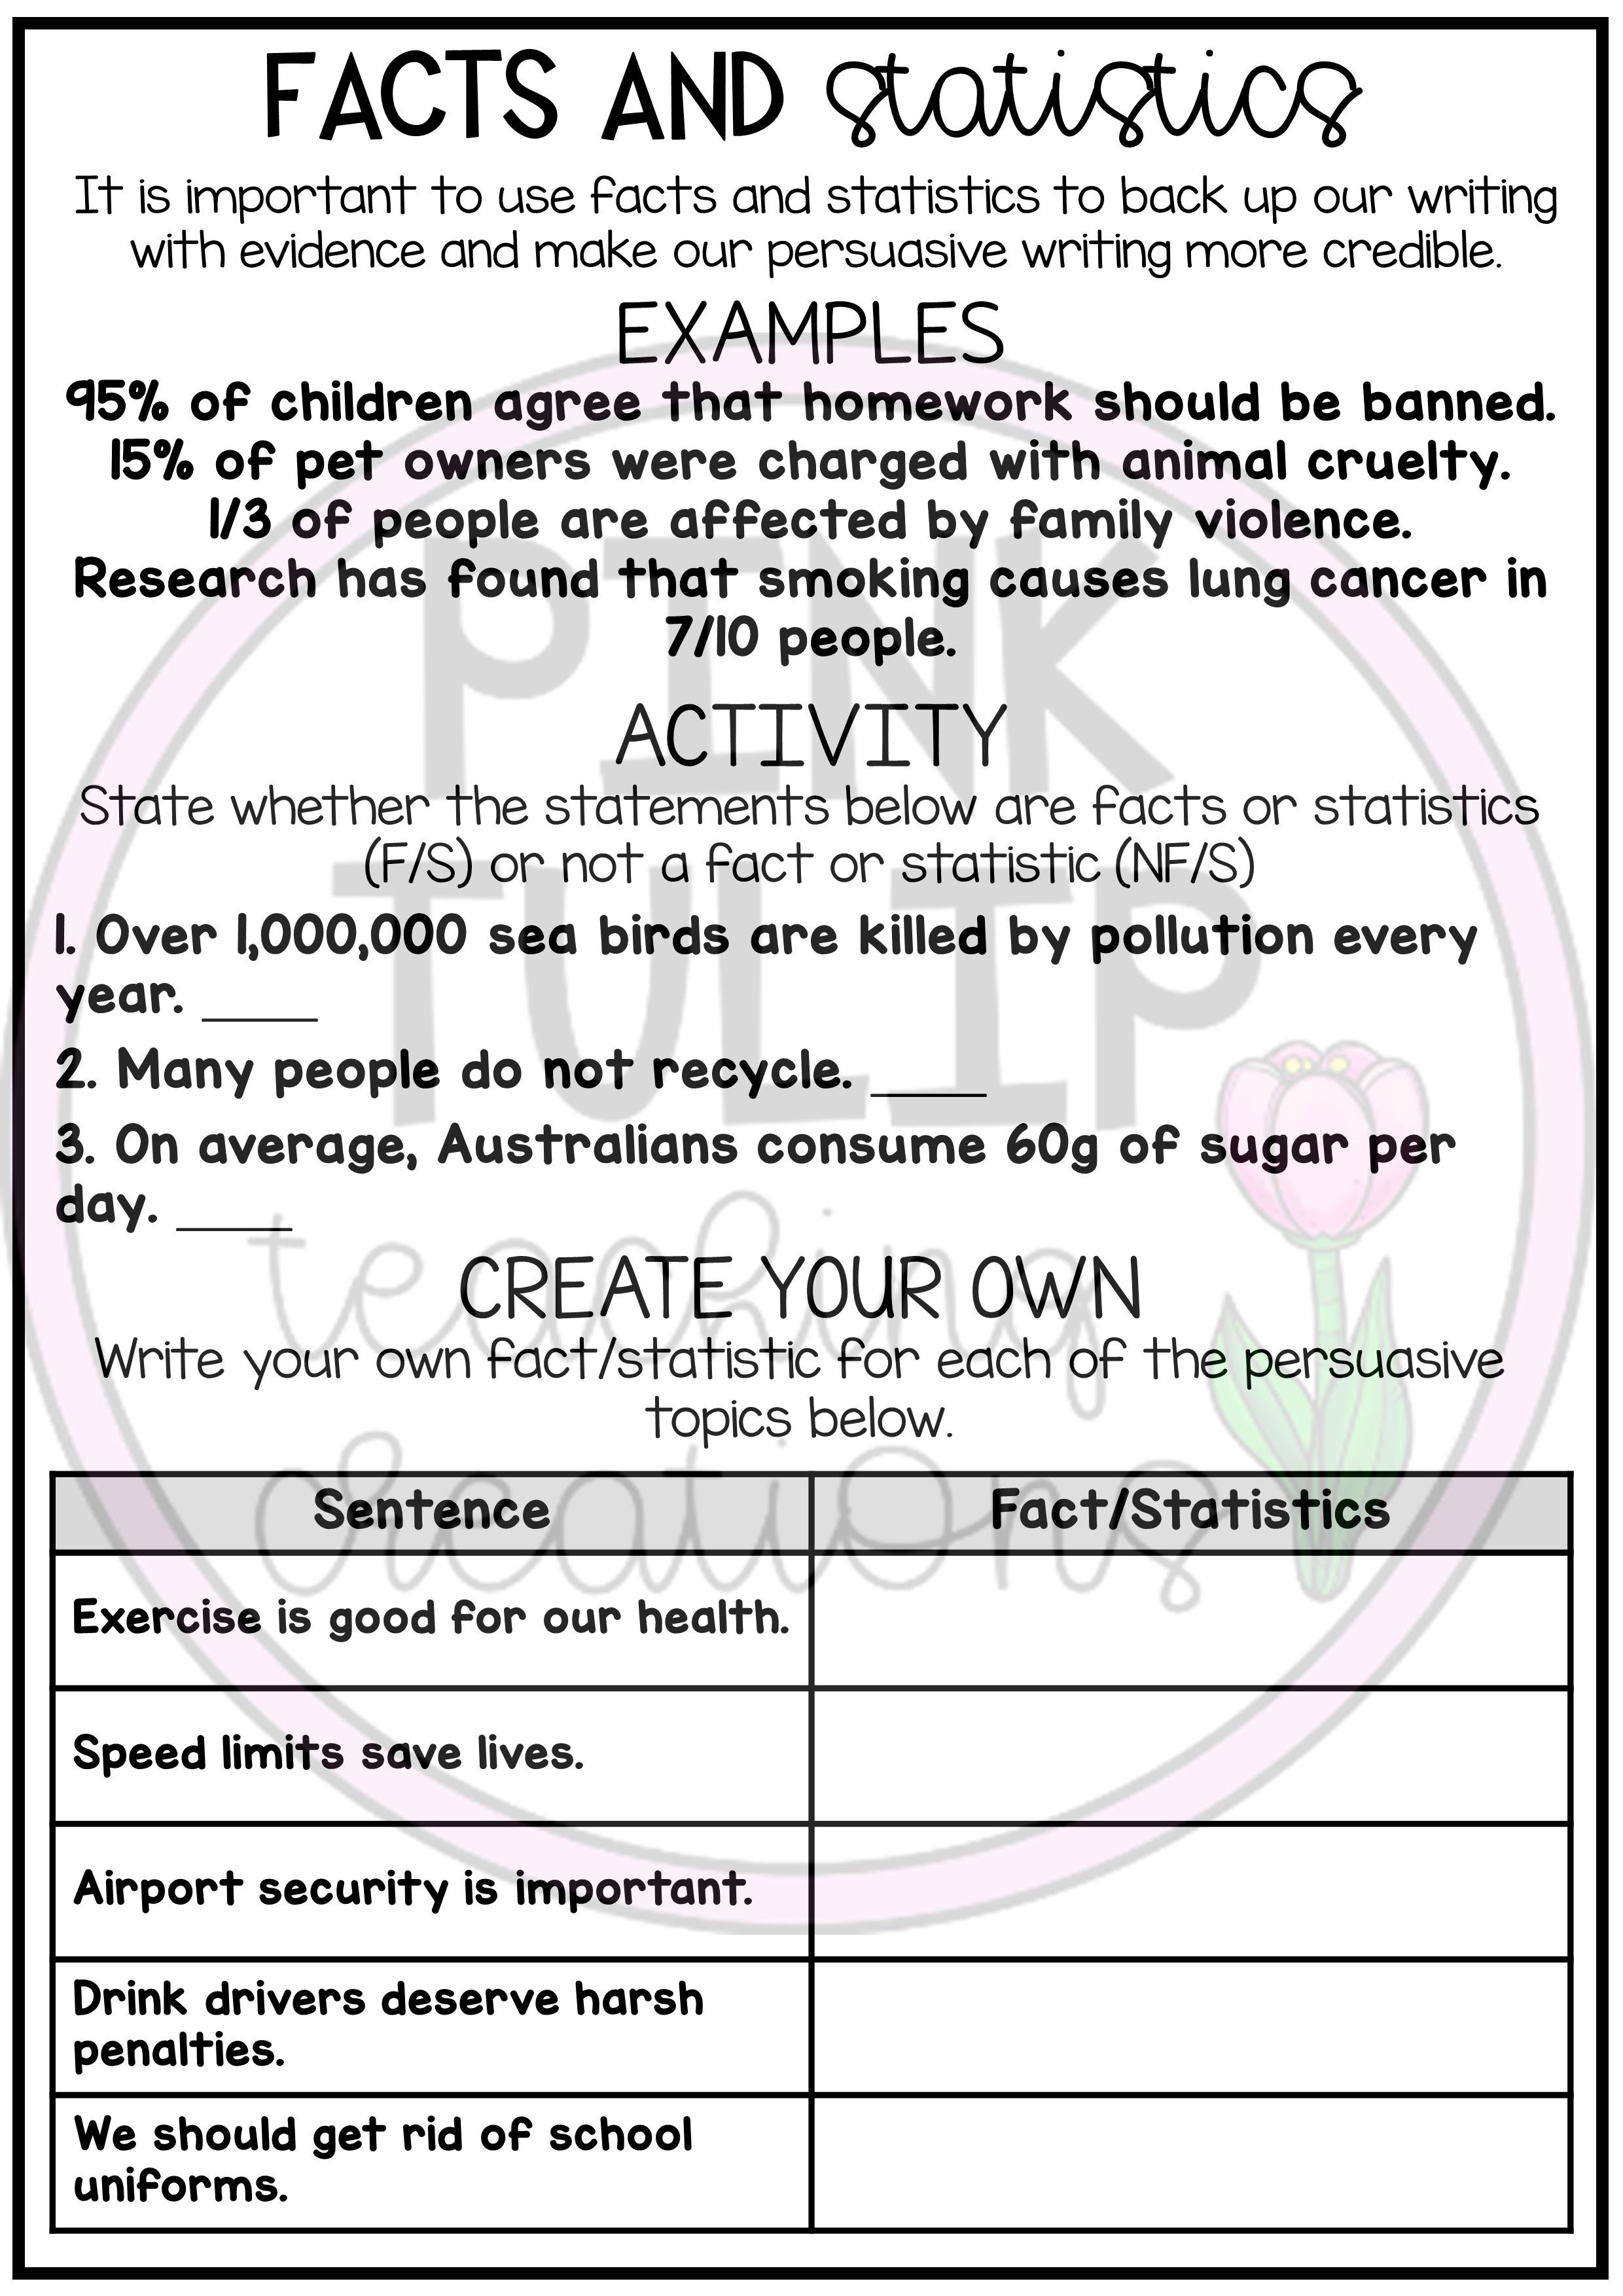 Persuasive Writing Worksheet Pack - No Prep Lesson Ideas   Persuasive  writing [ 3508 x 2480 Pixel ]